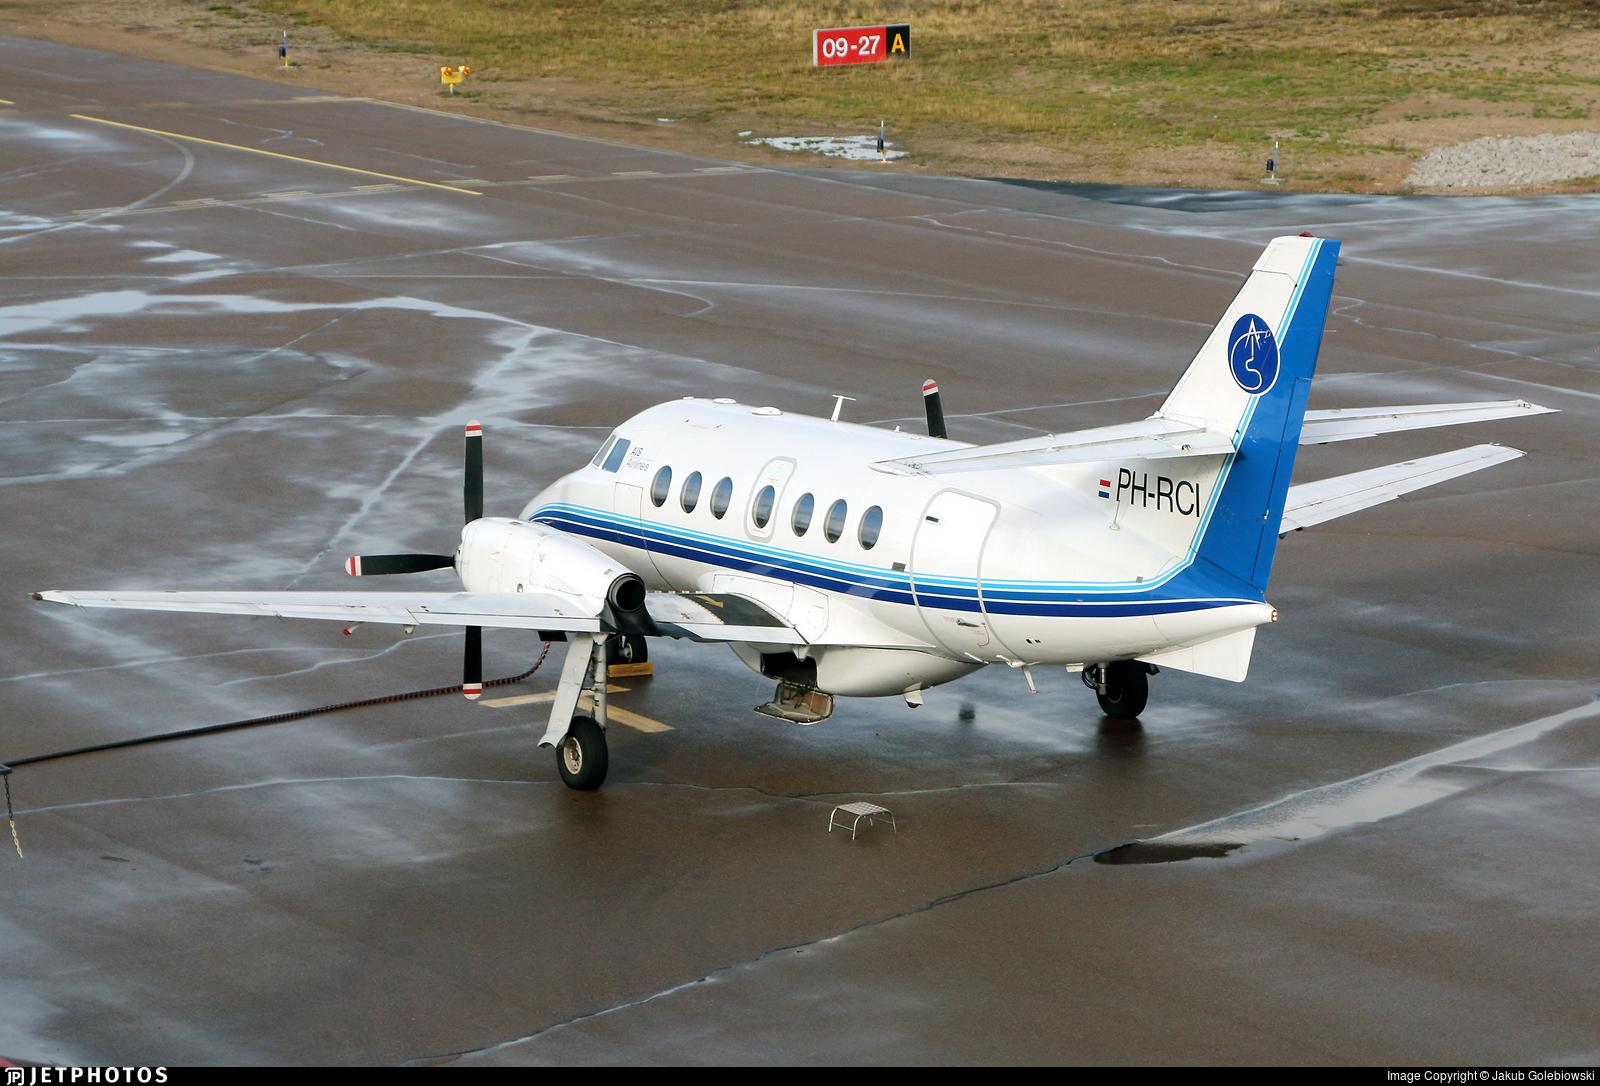 PH-RCI - British Aerospace Jetstream 32EP - AIS Airlines